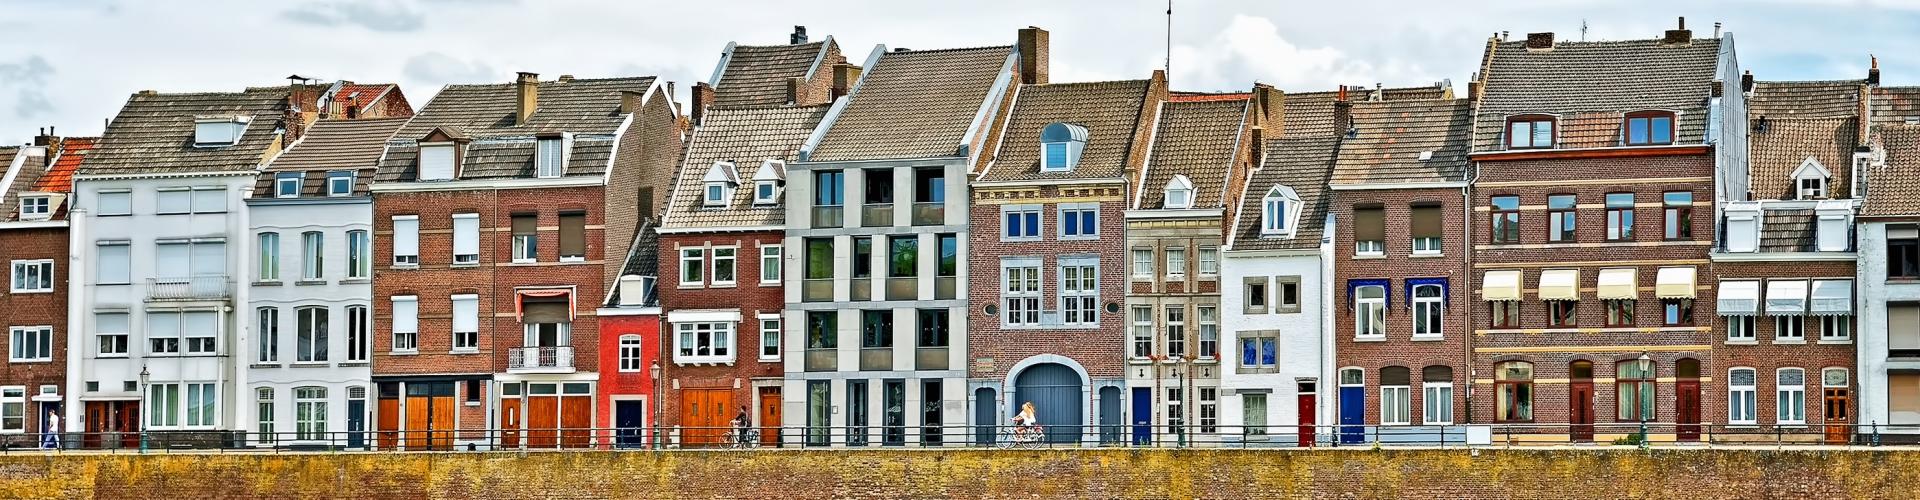 stadcentrum Maastricht Limburg